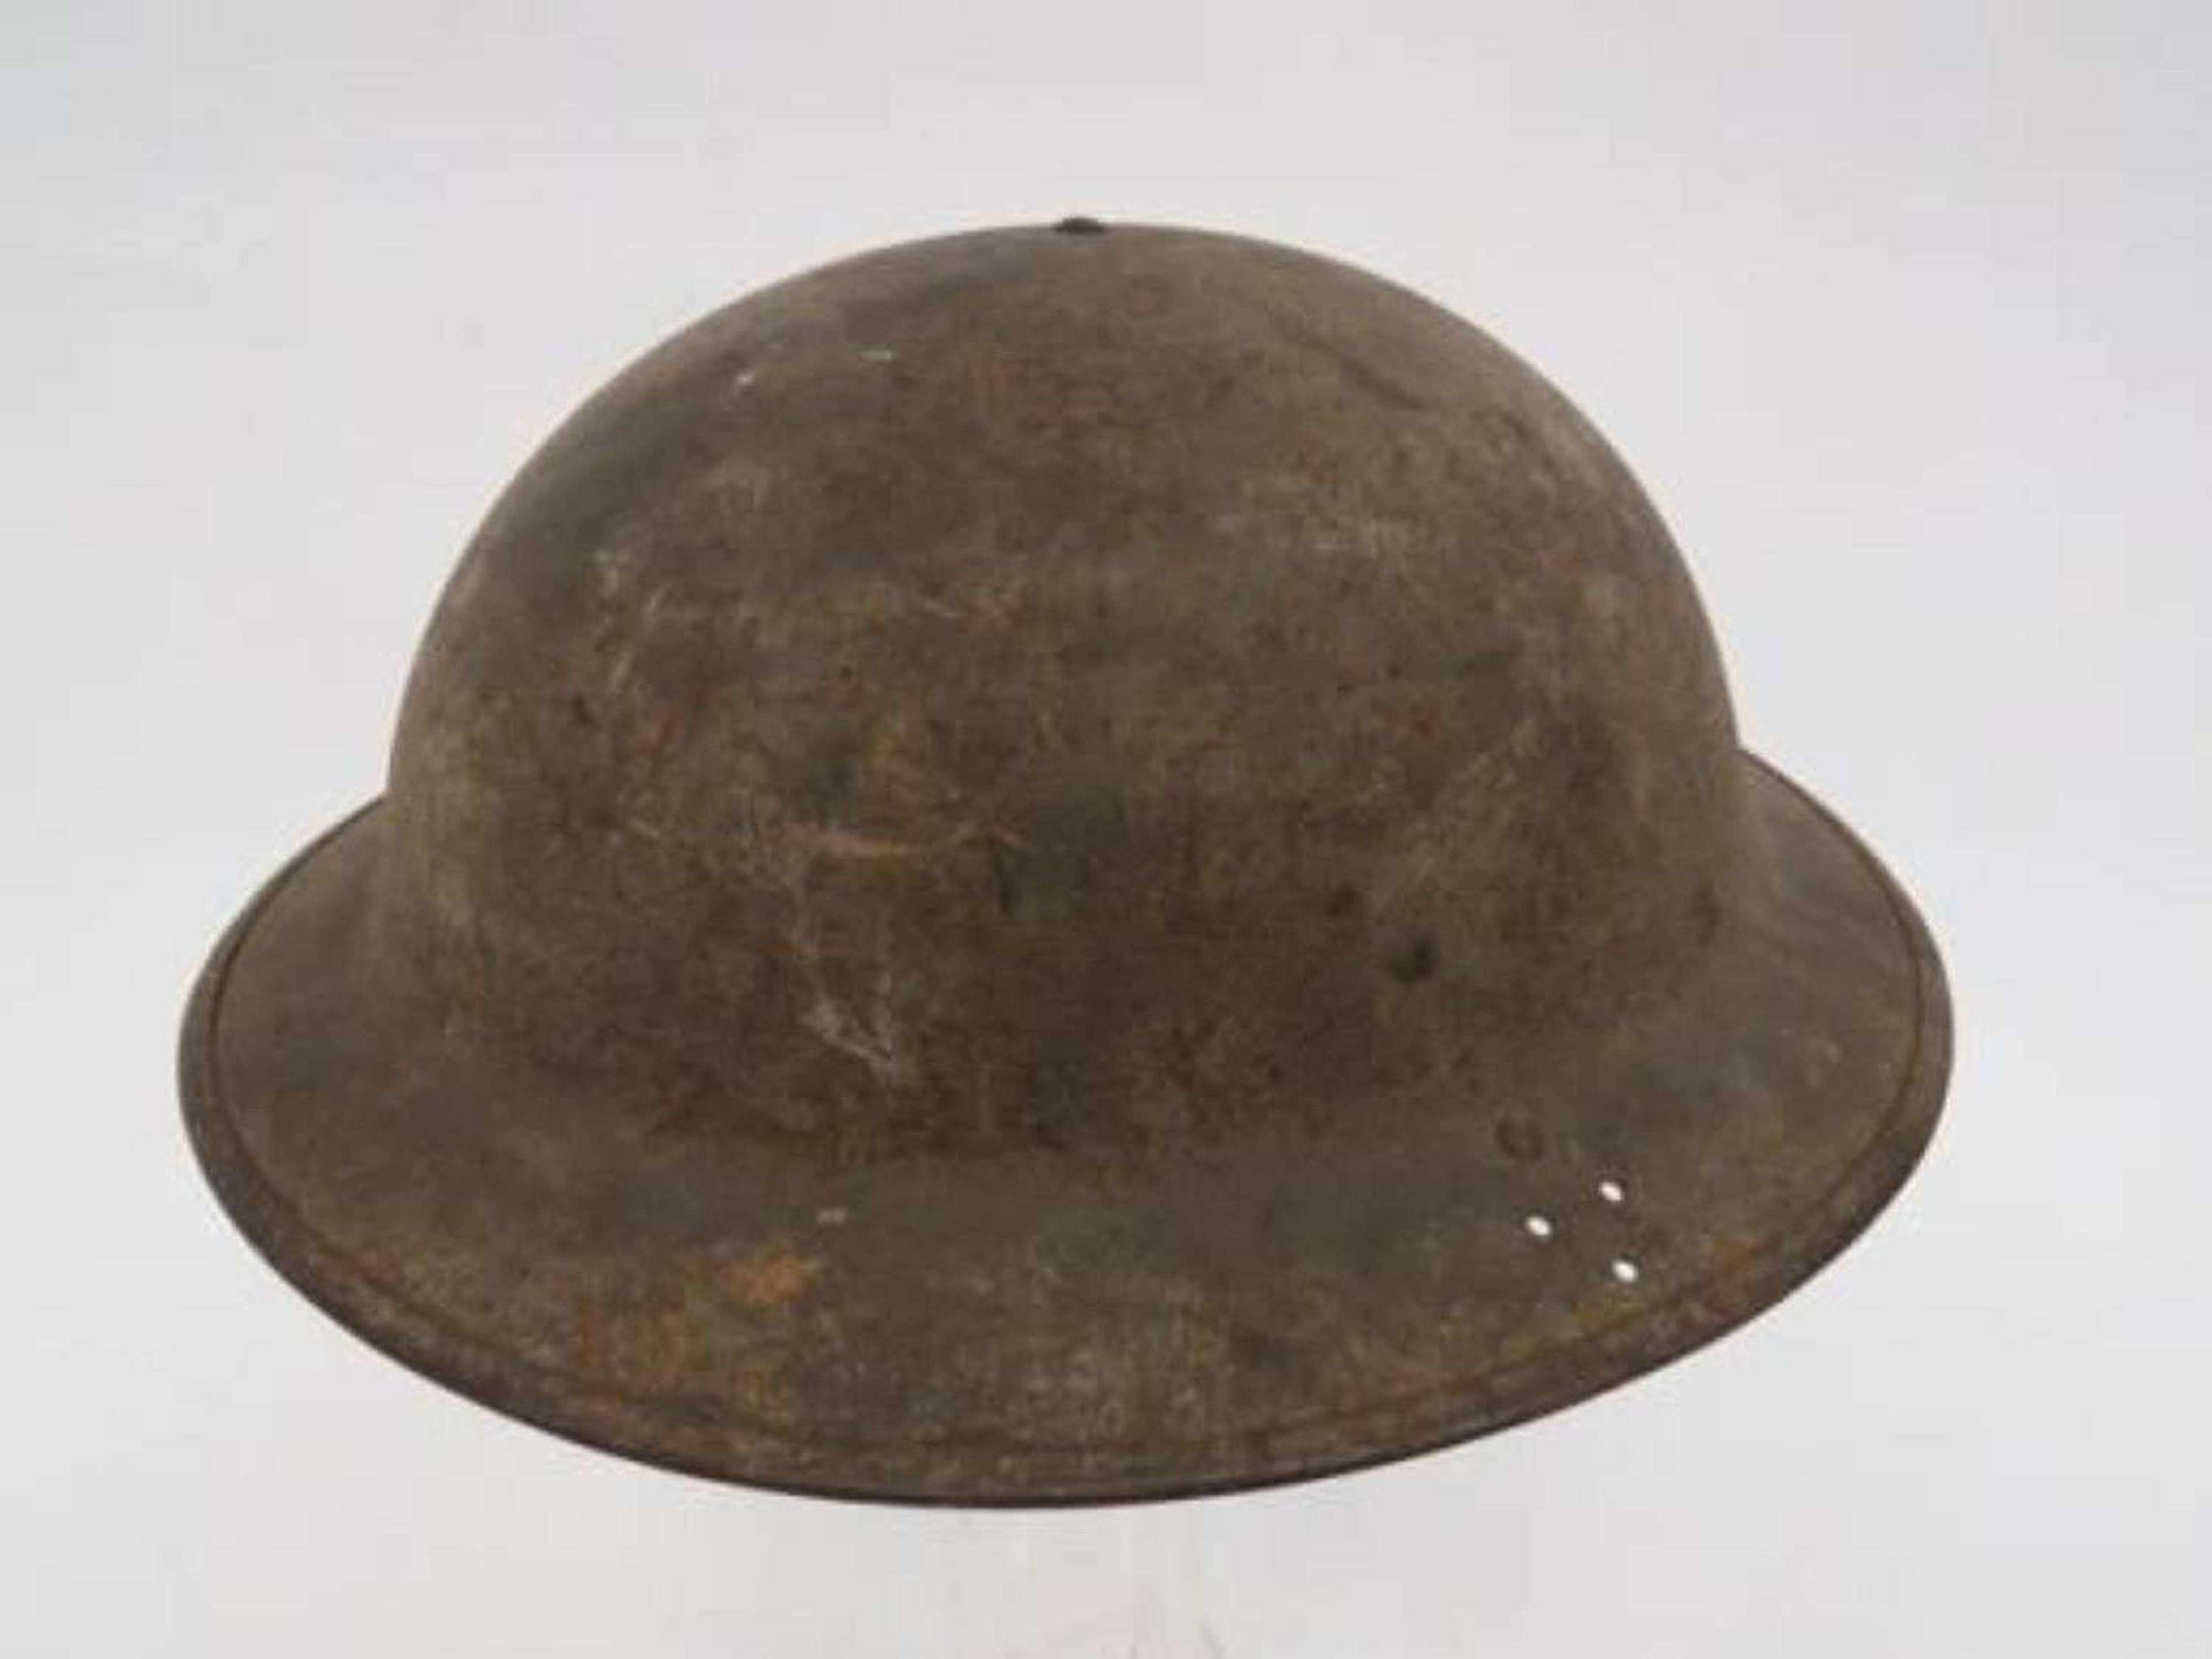 1940 Dated Home Guard MKII Helmet